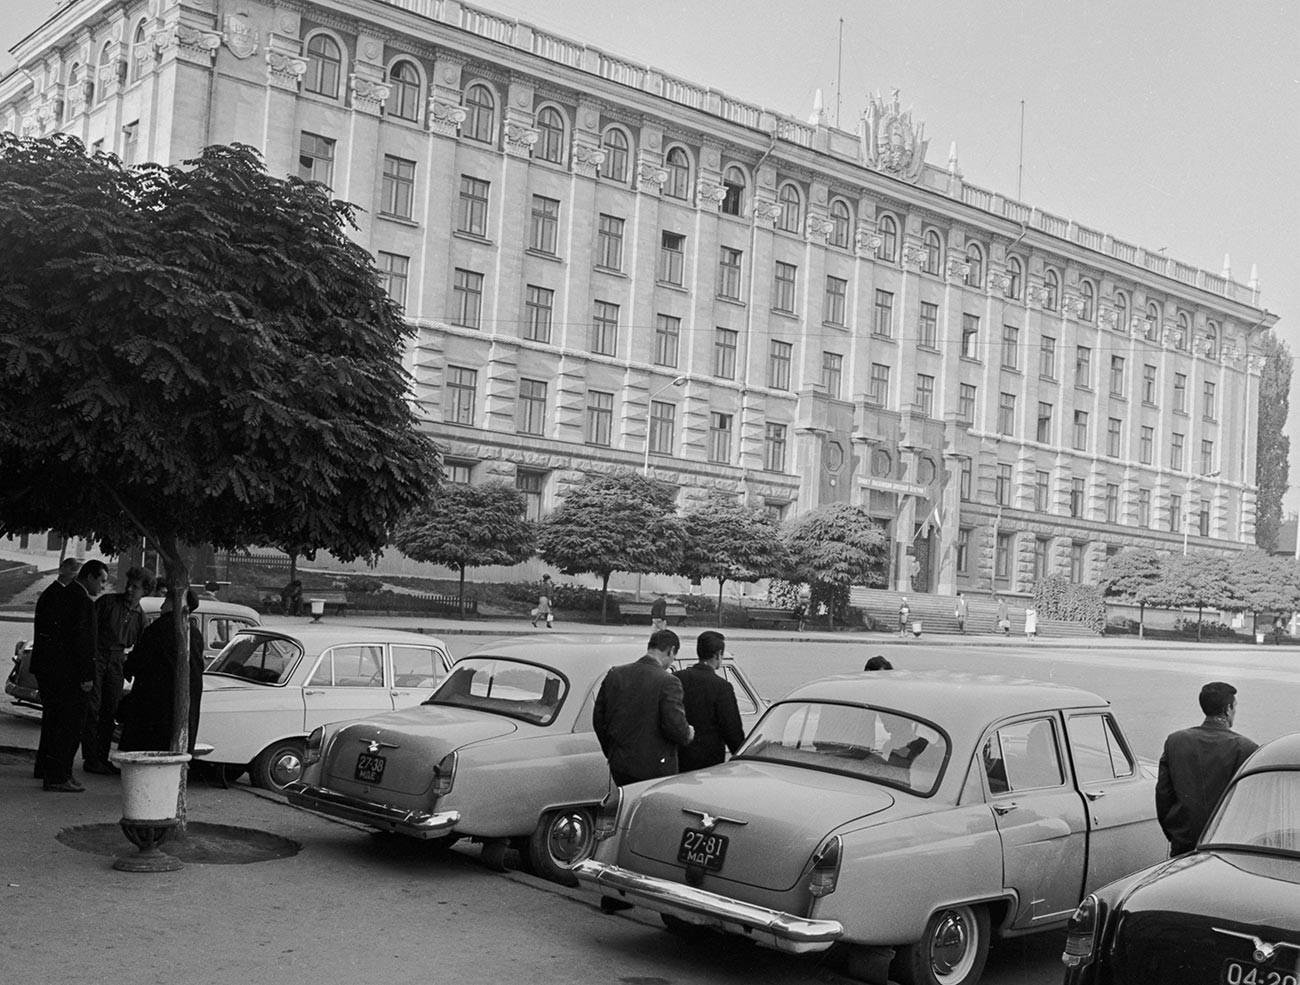 Зграда Академије наука Молдавске ССР у Кишињову, 1966.